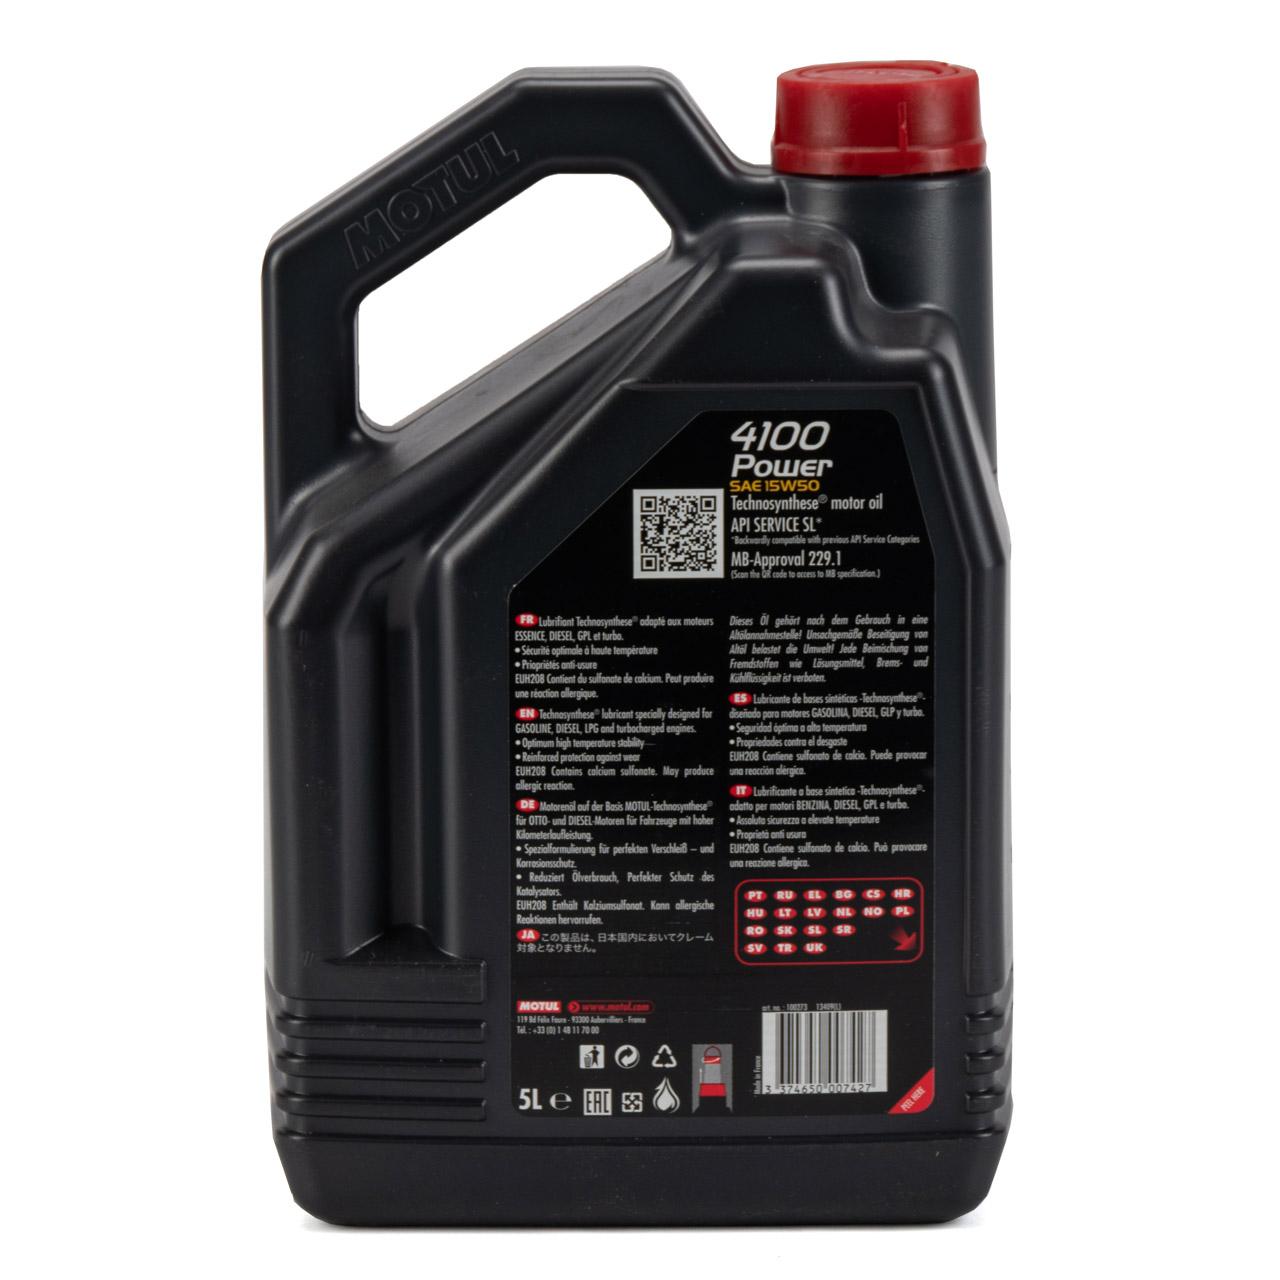 MOTUL 4100 Power Motoröl Öl 15W50 MB 229.1 für VW 501.01/505.00 - 5L 5 Liter